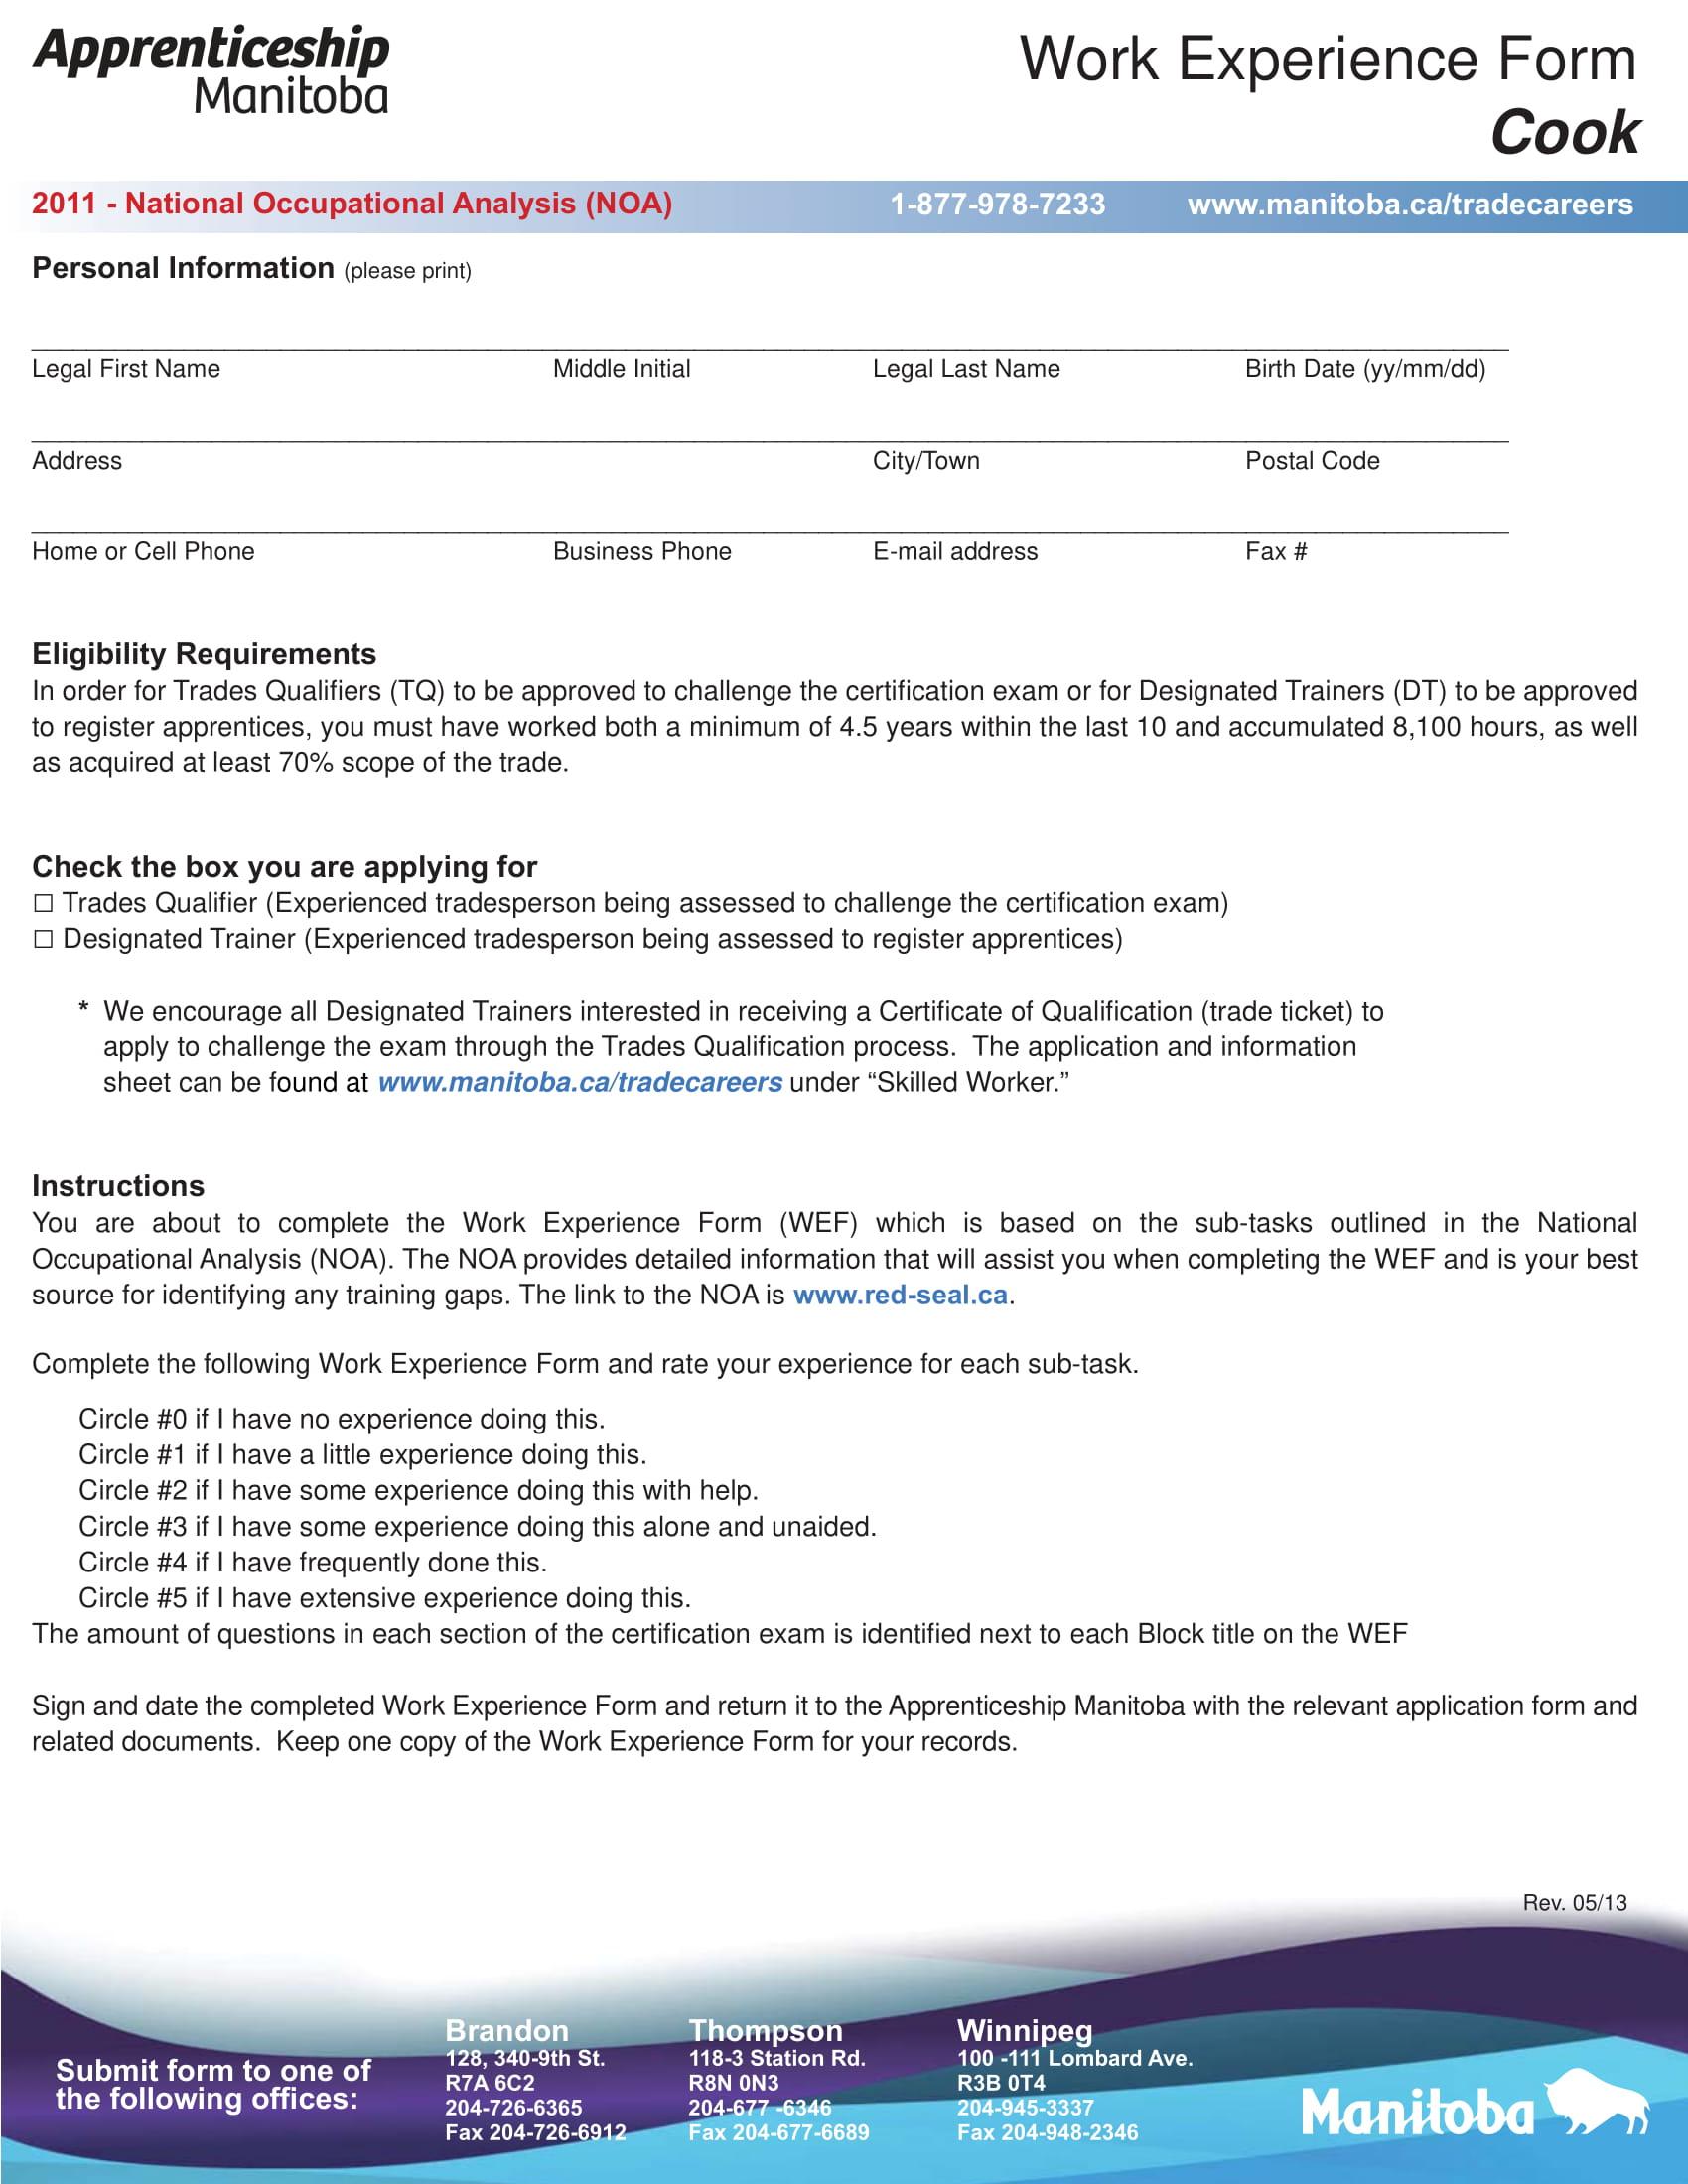 restaurant employee work experience form 01